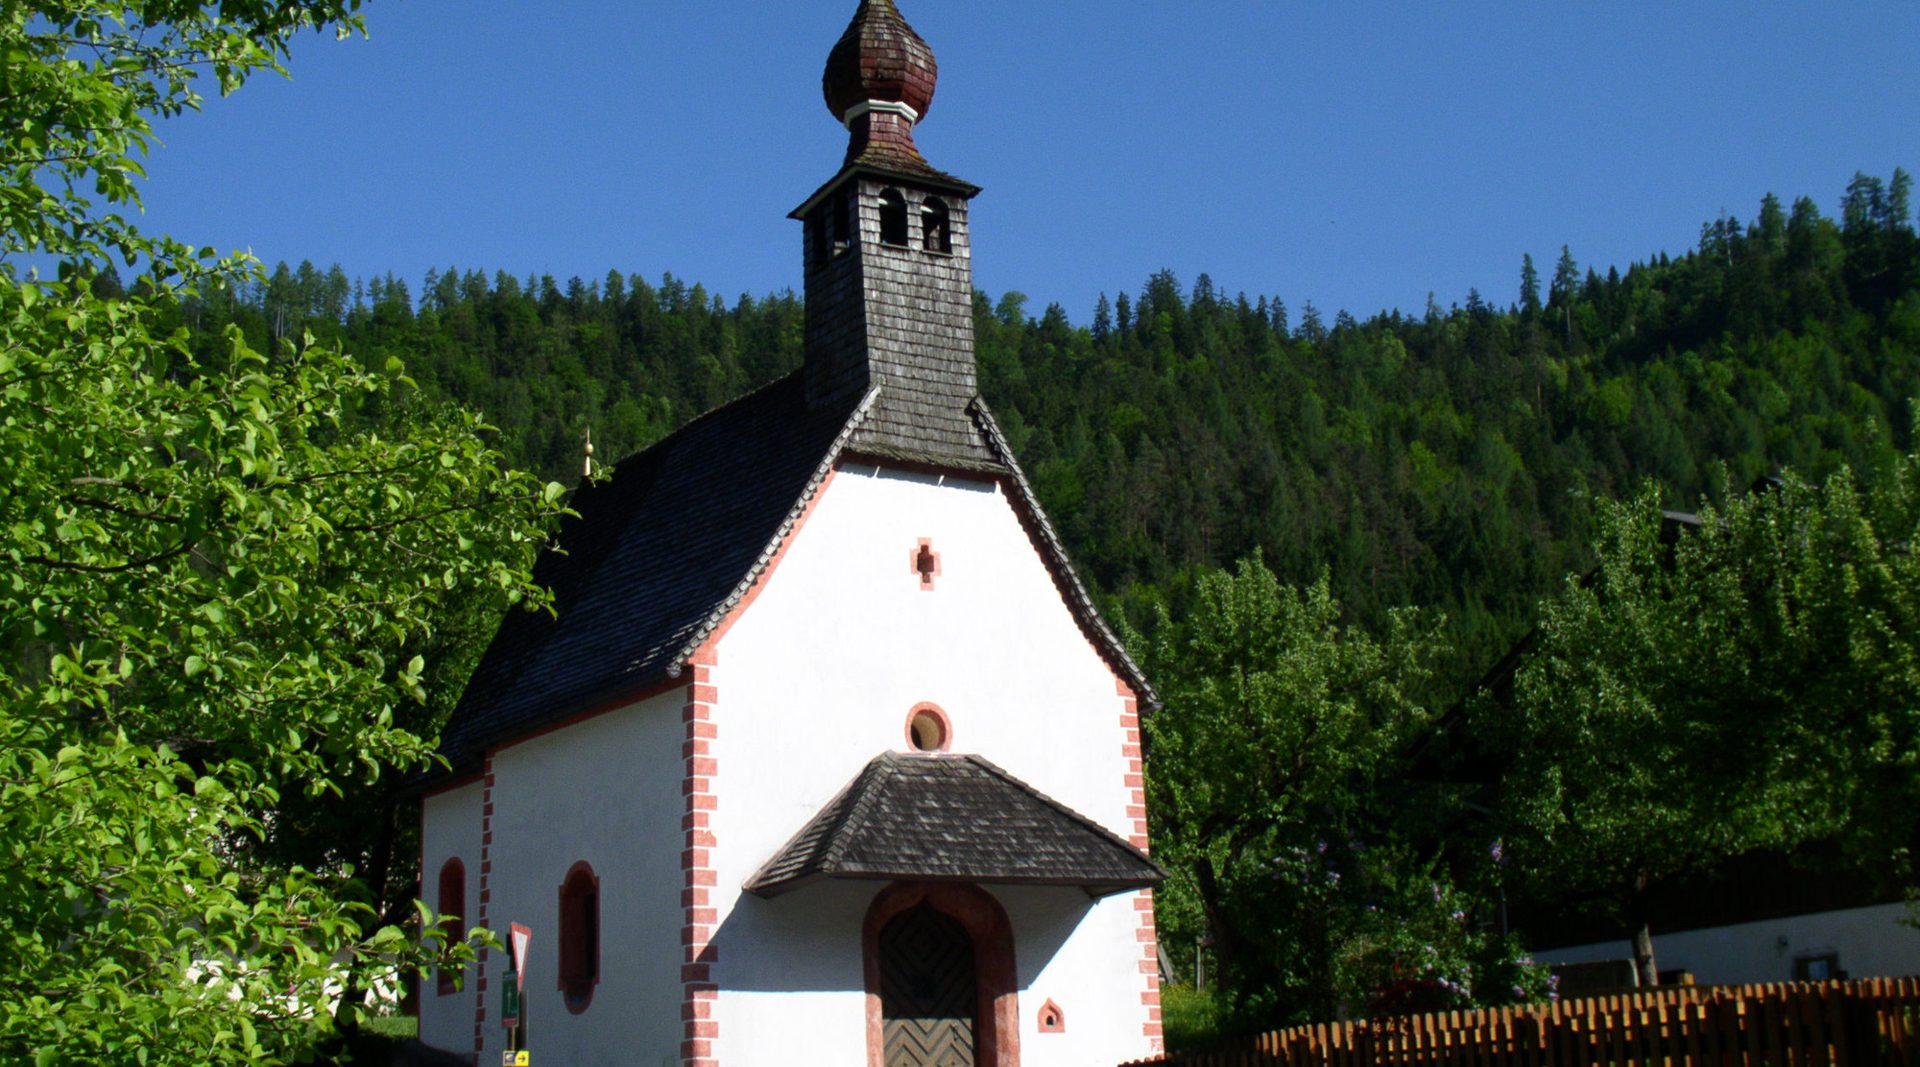 Kapelle am Jakobsweg bei Reit